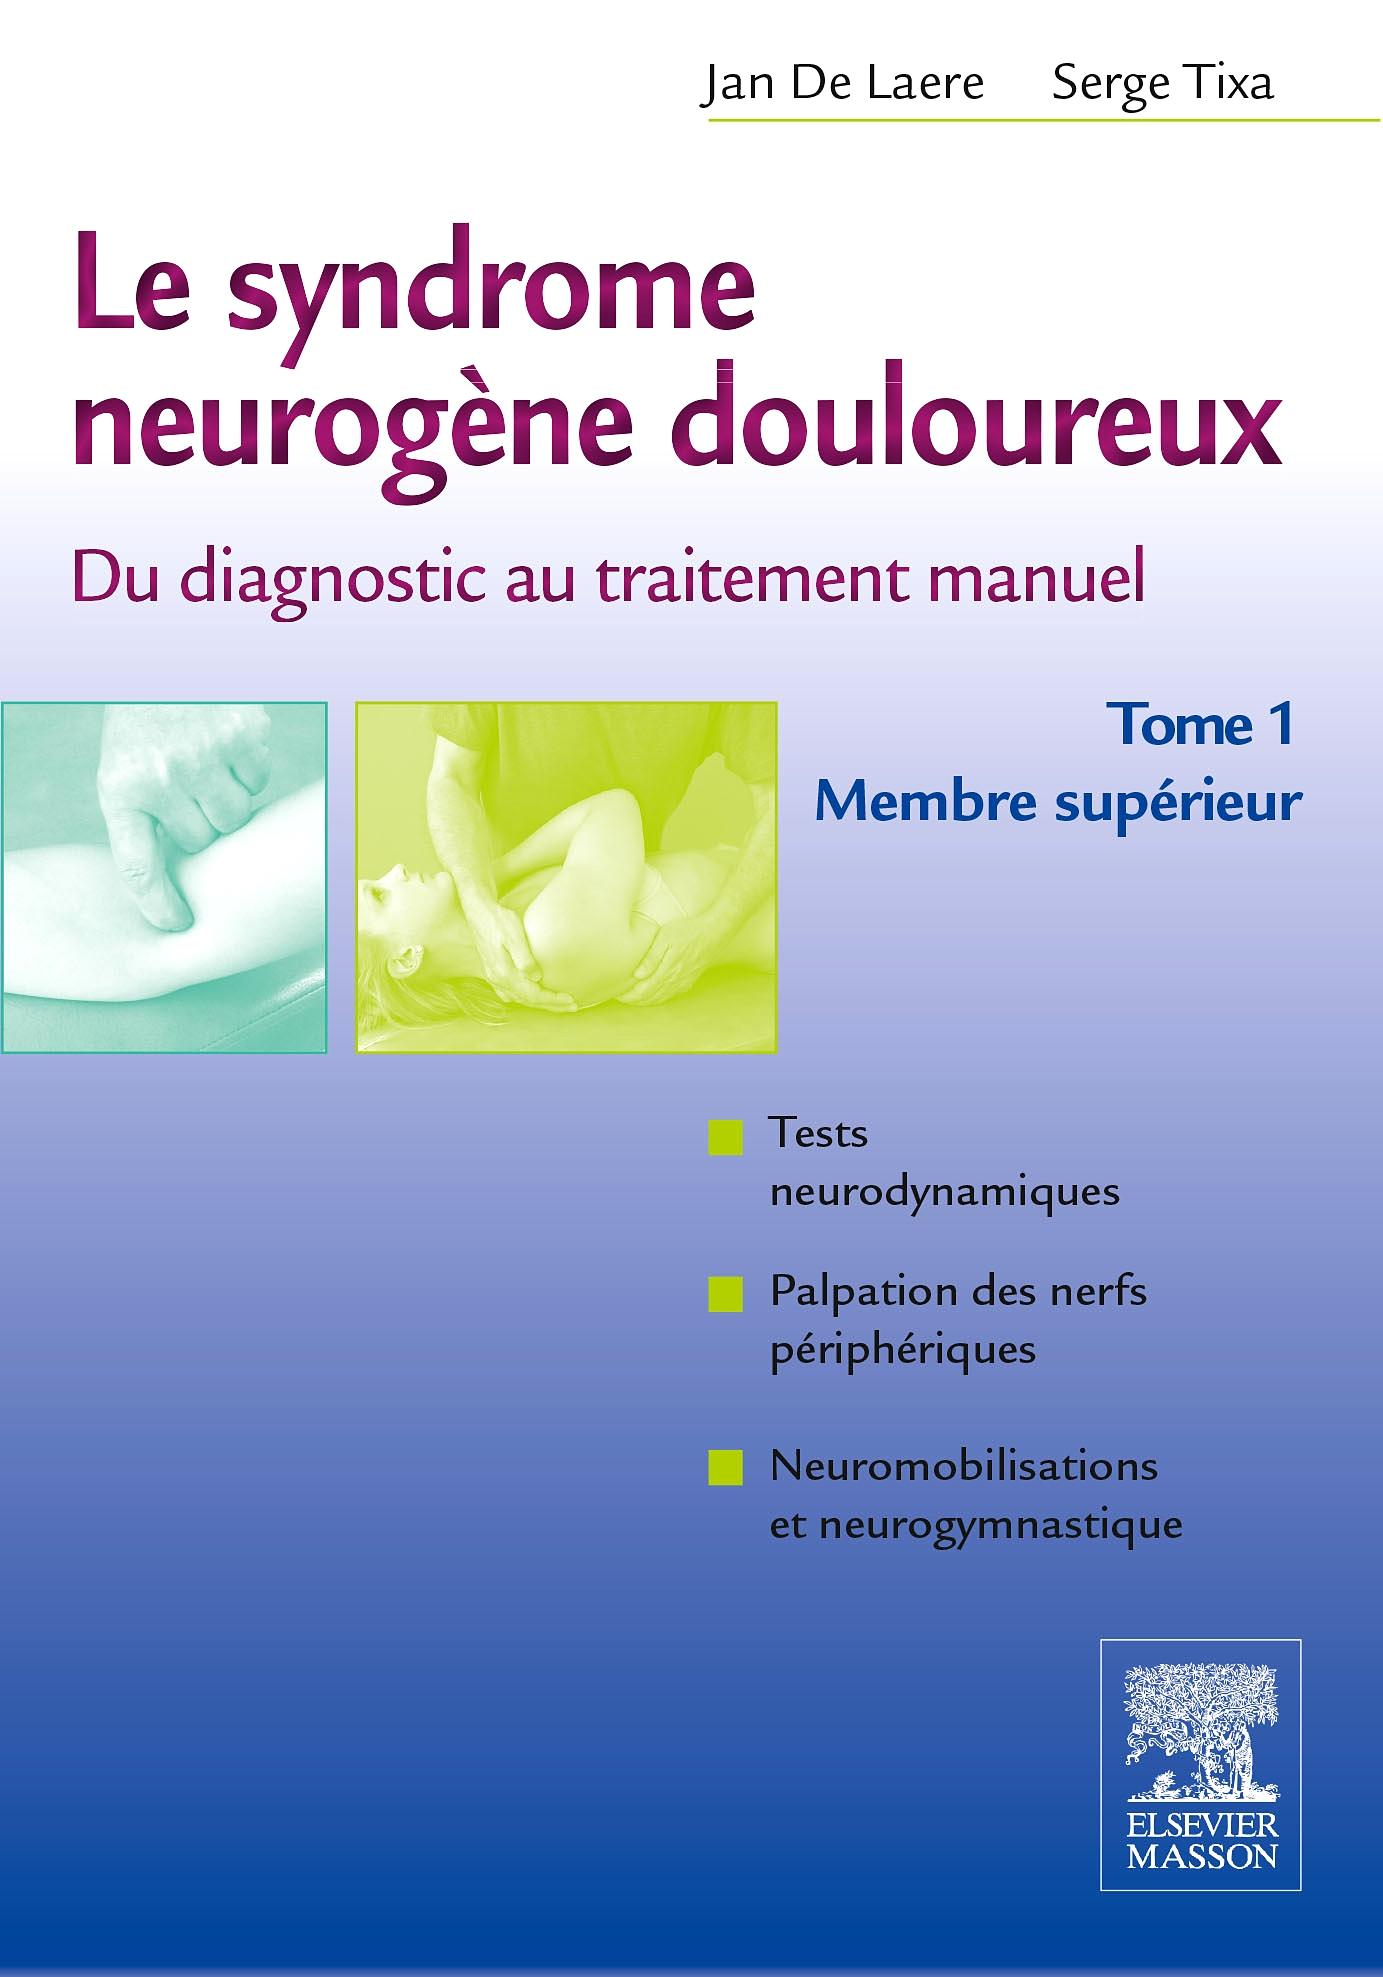 Book Neuropsychological Sequelae Of Subarachnoid Hemorrhage And Its Treatment